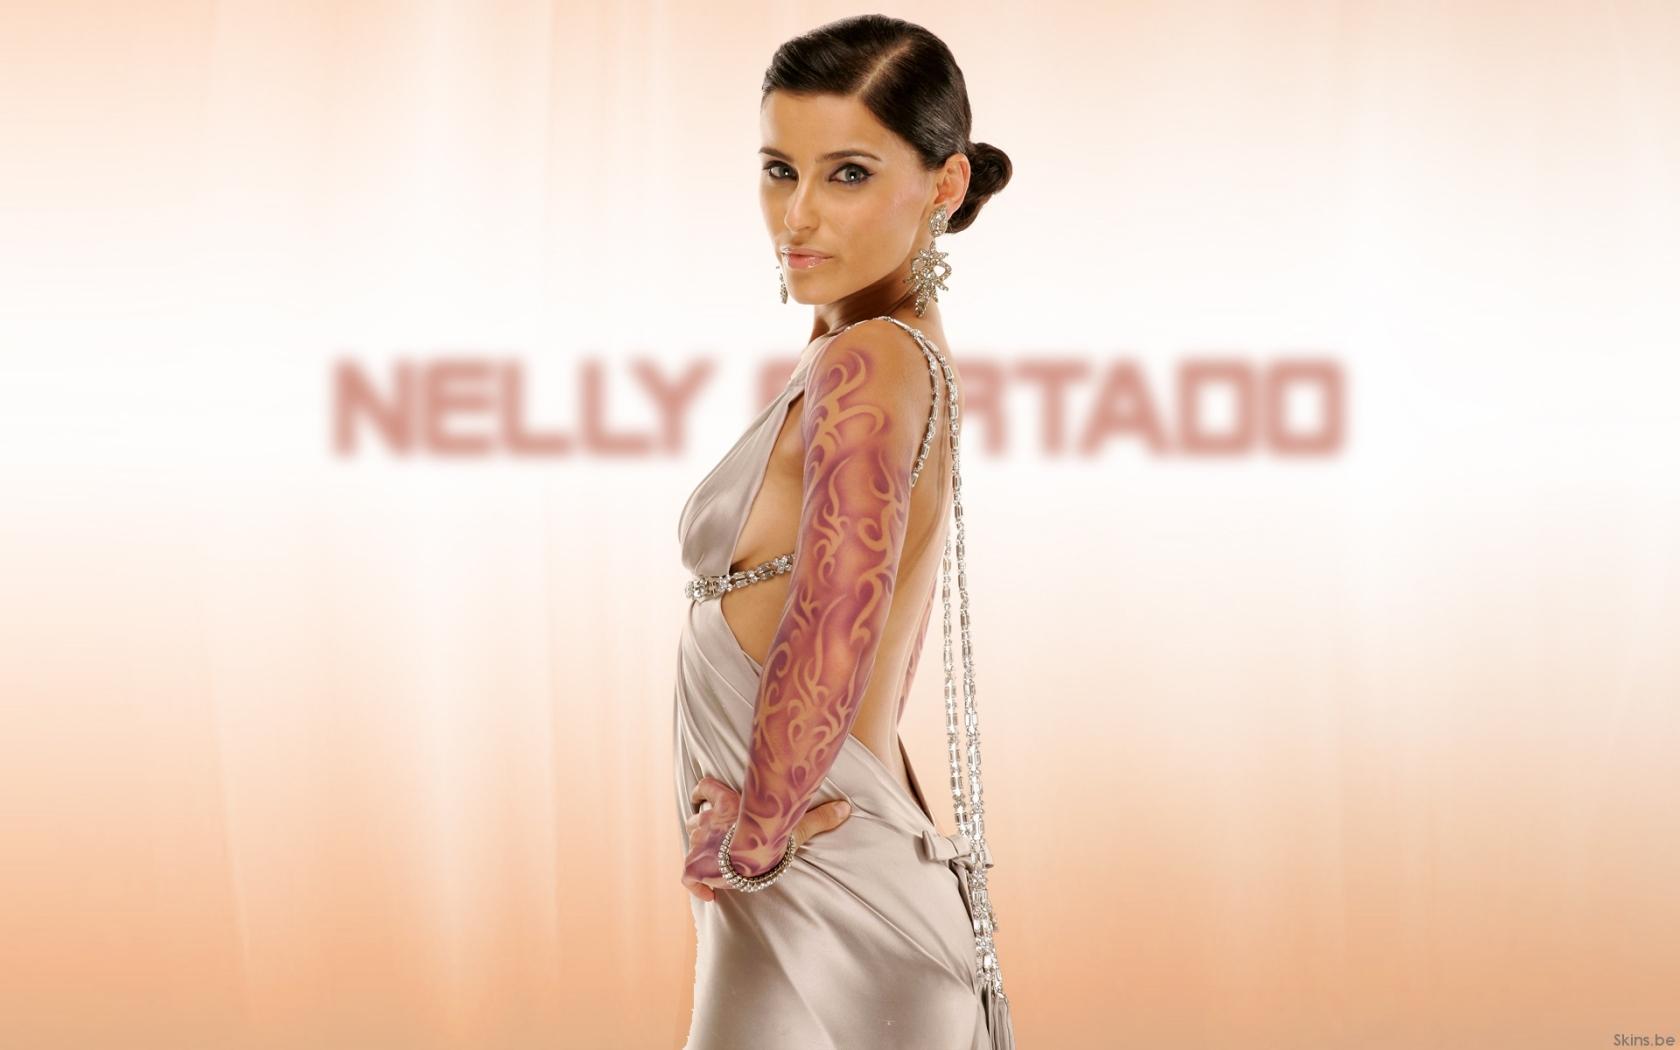 Nelly Furtado wallpaper (#35629)